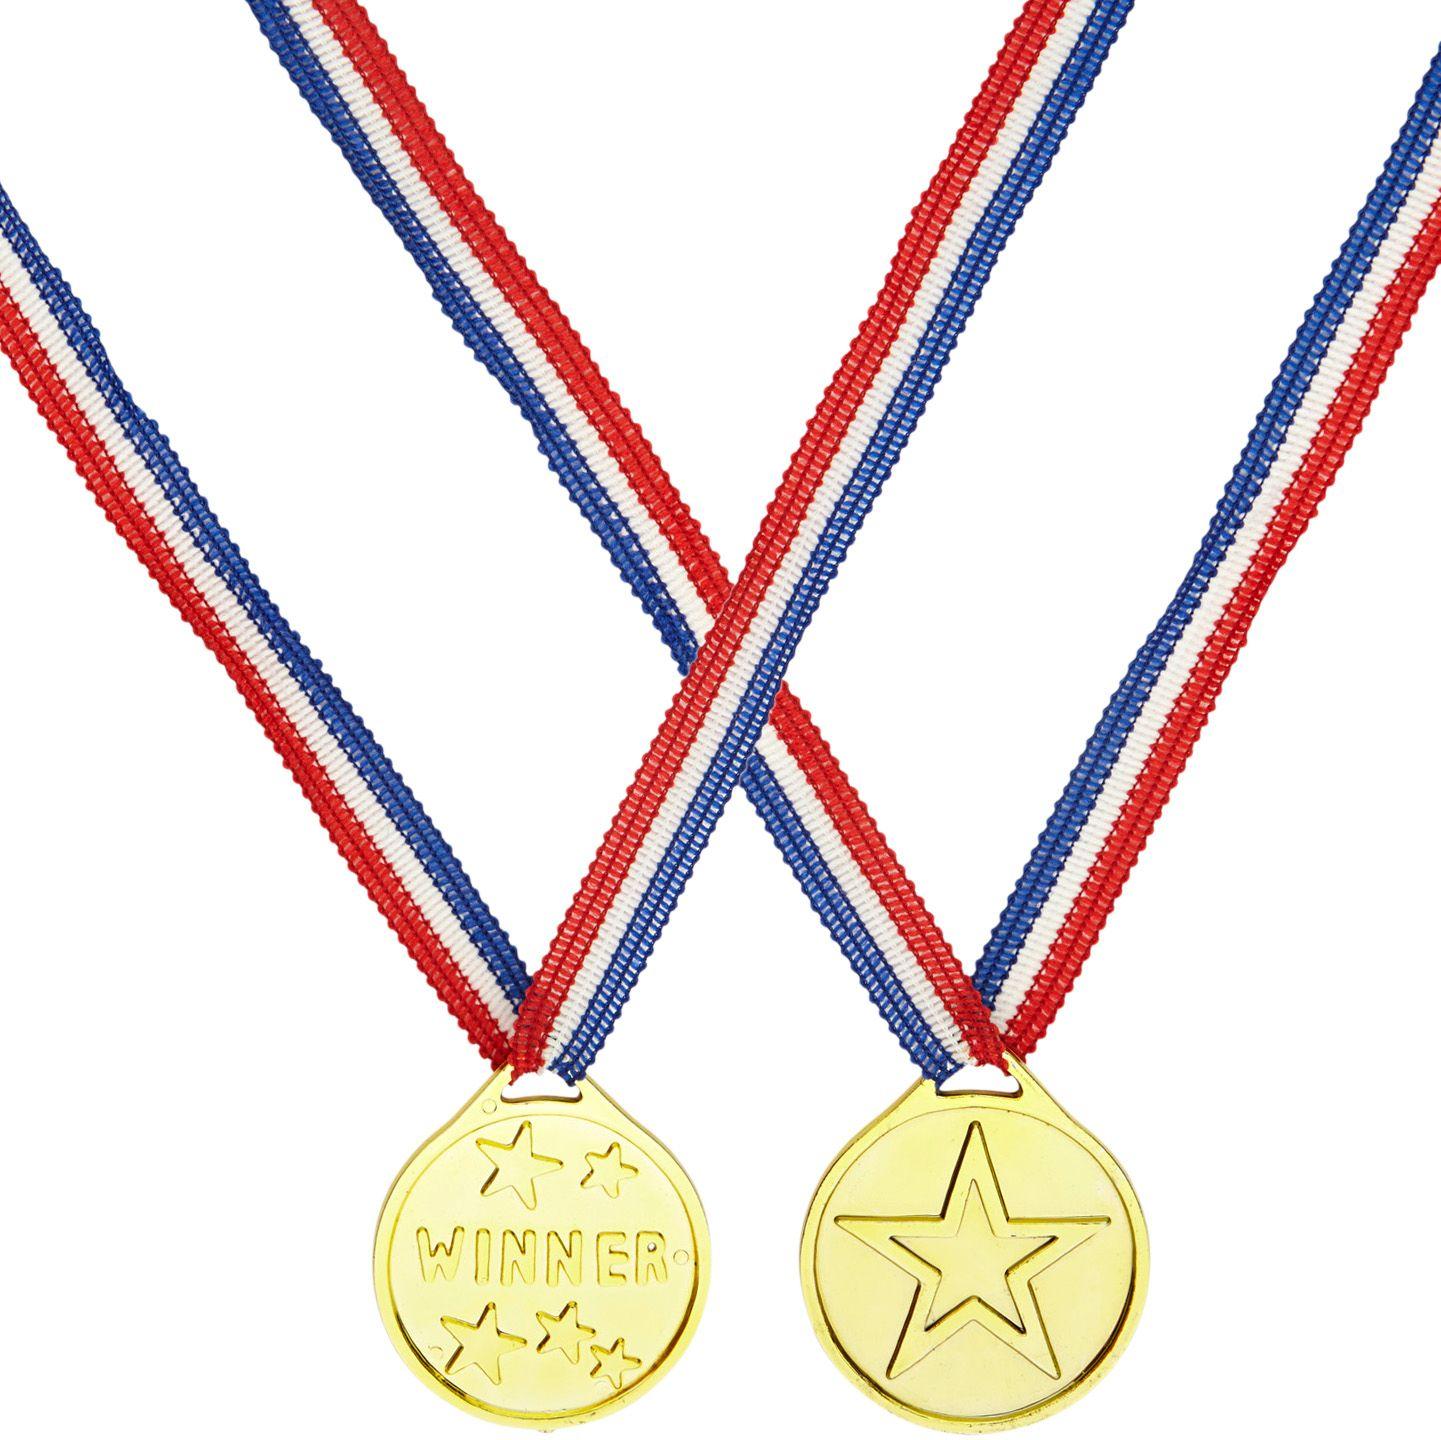 Gouden winnaars medaille